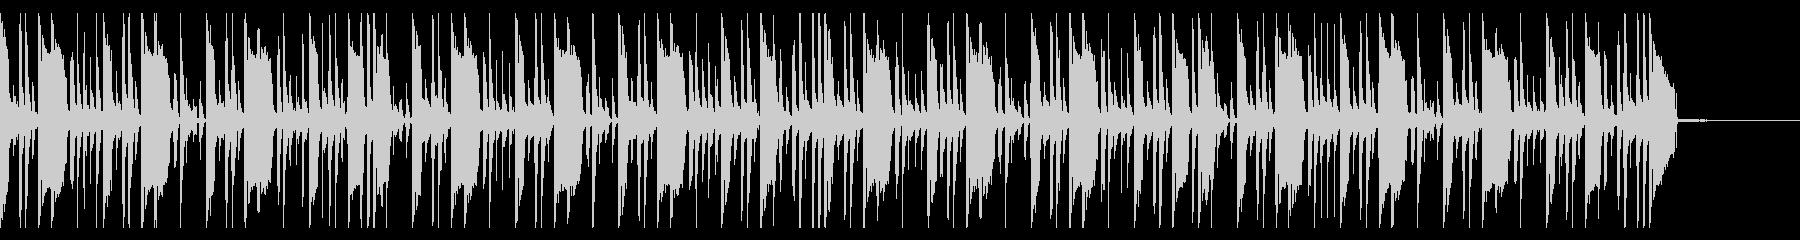 145 BPMの未再生の波形